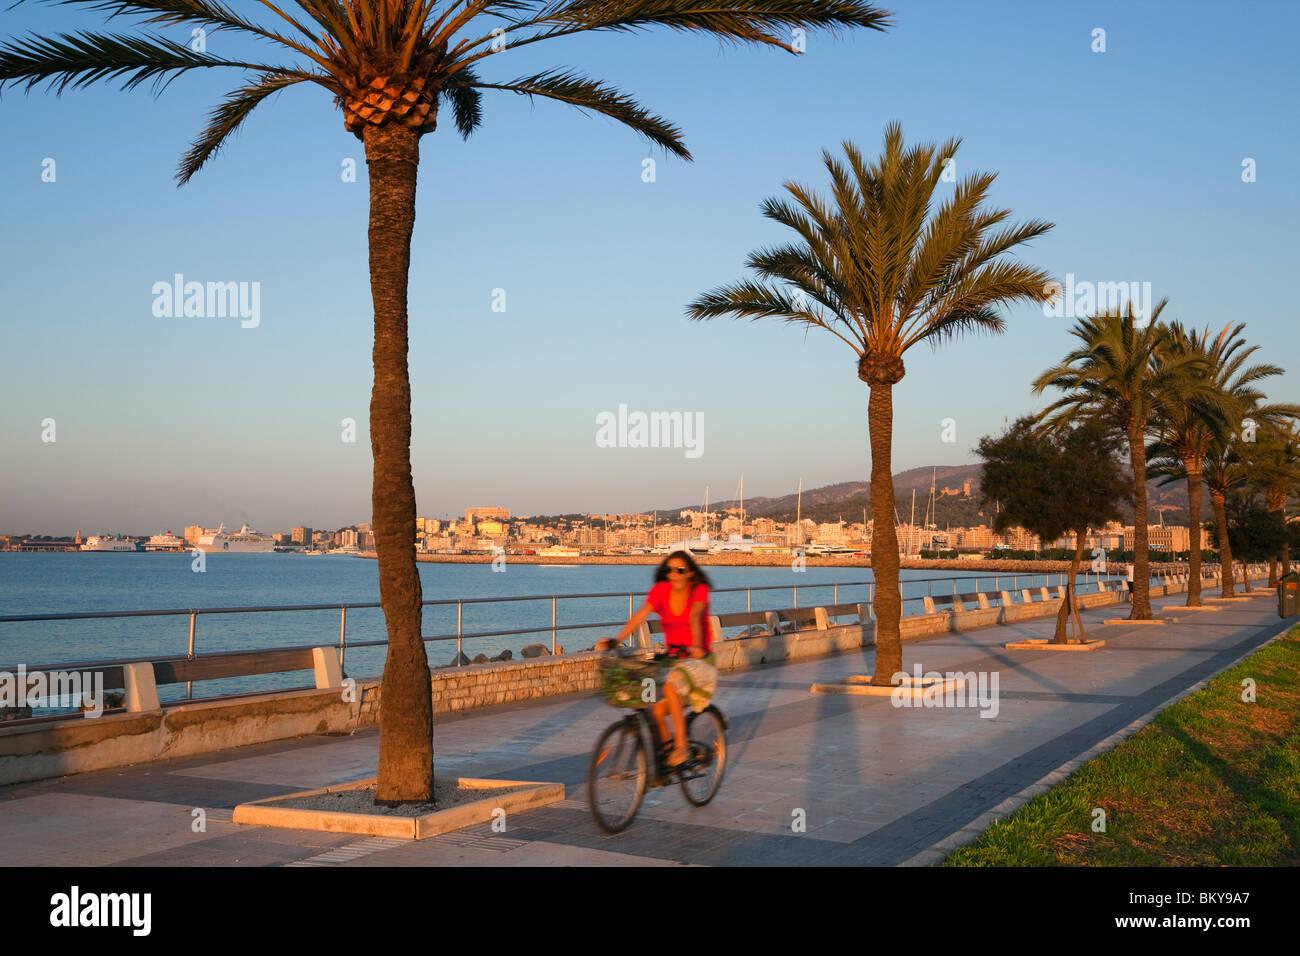 Cyclist at waterfront promenade Avinguda Gabriel Roca at sunrise, Palma, Mallorca, Balearic Islands, Mediterranean - Stock Image